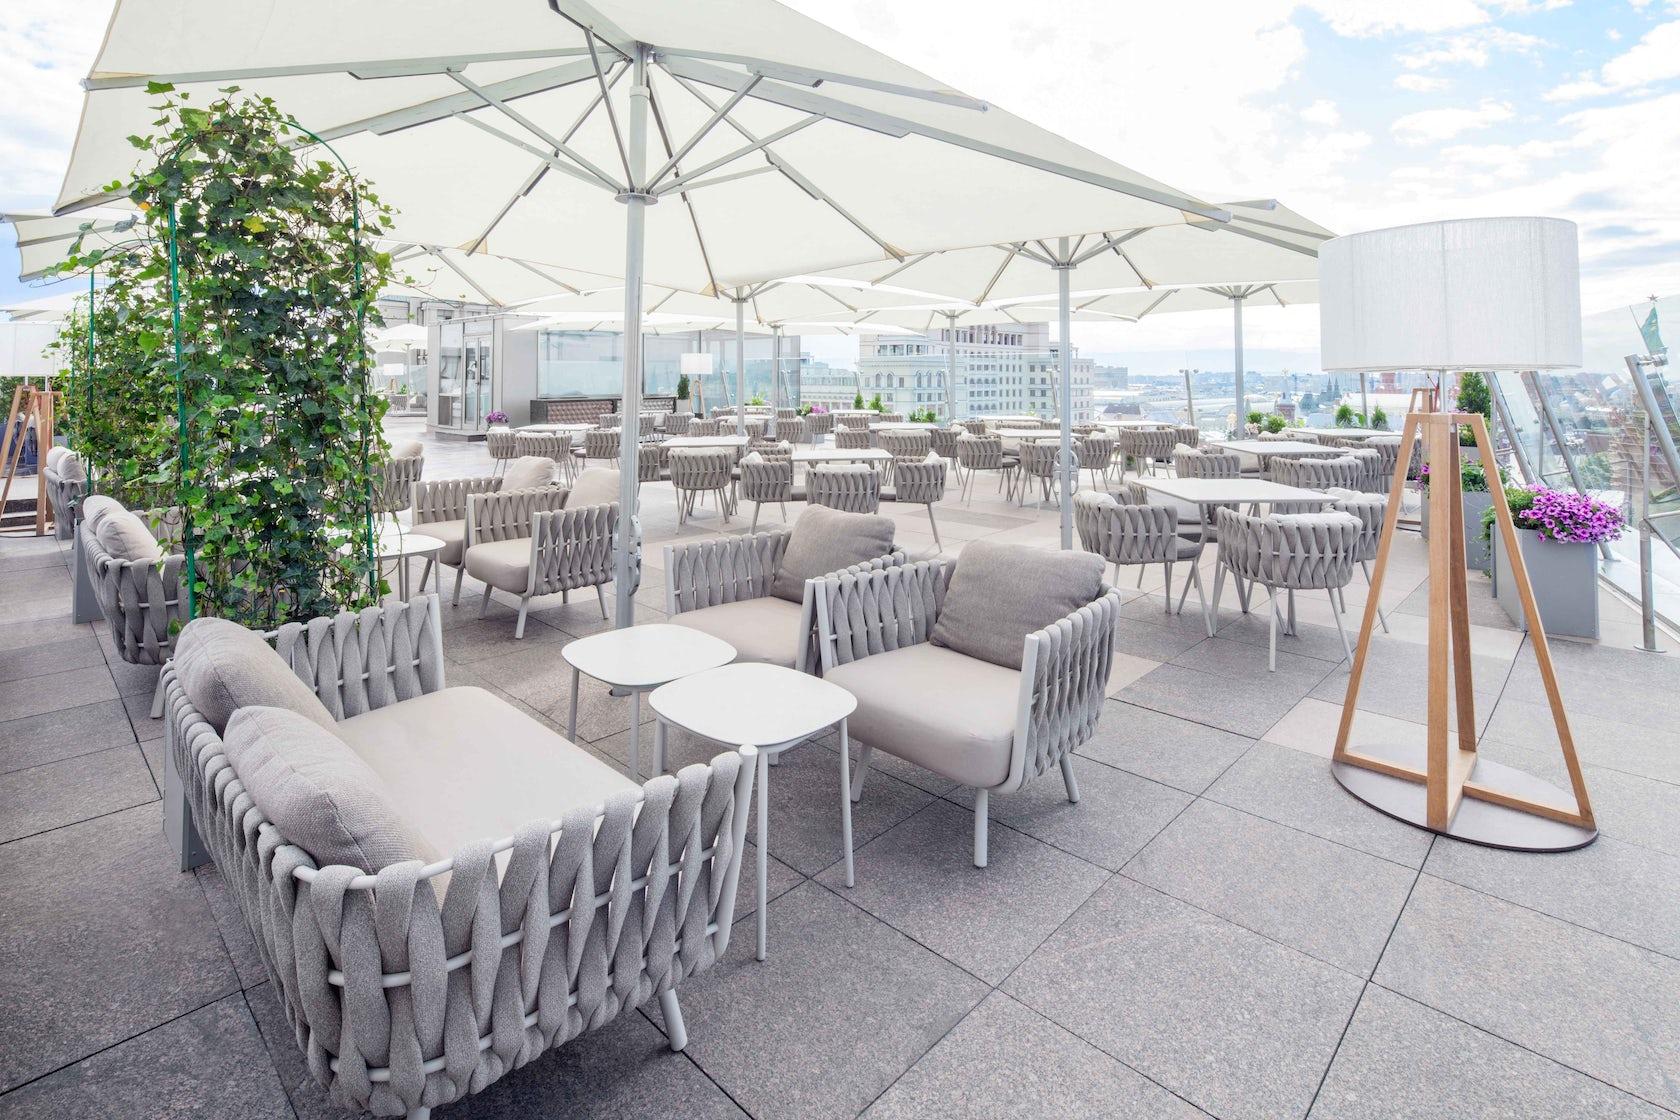 The Ritz-Carlton Hotel on Architizer